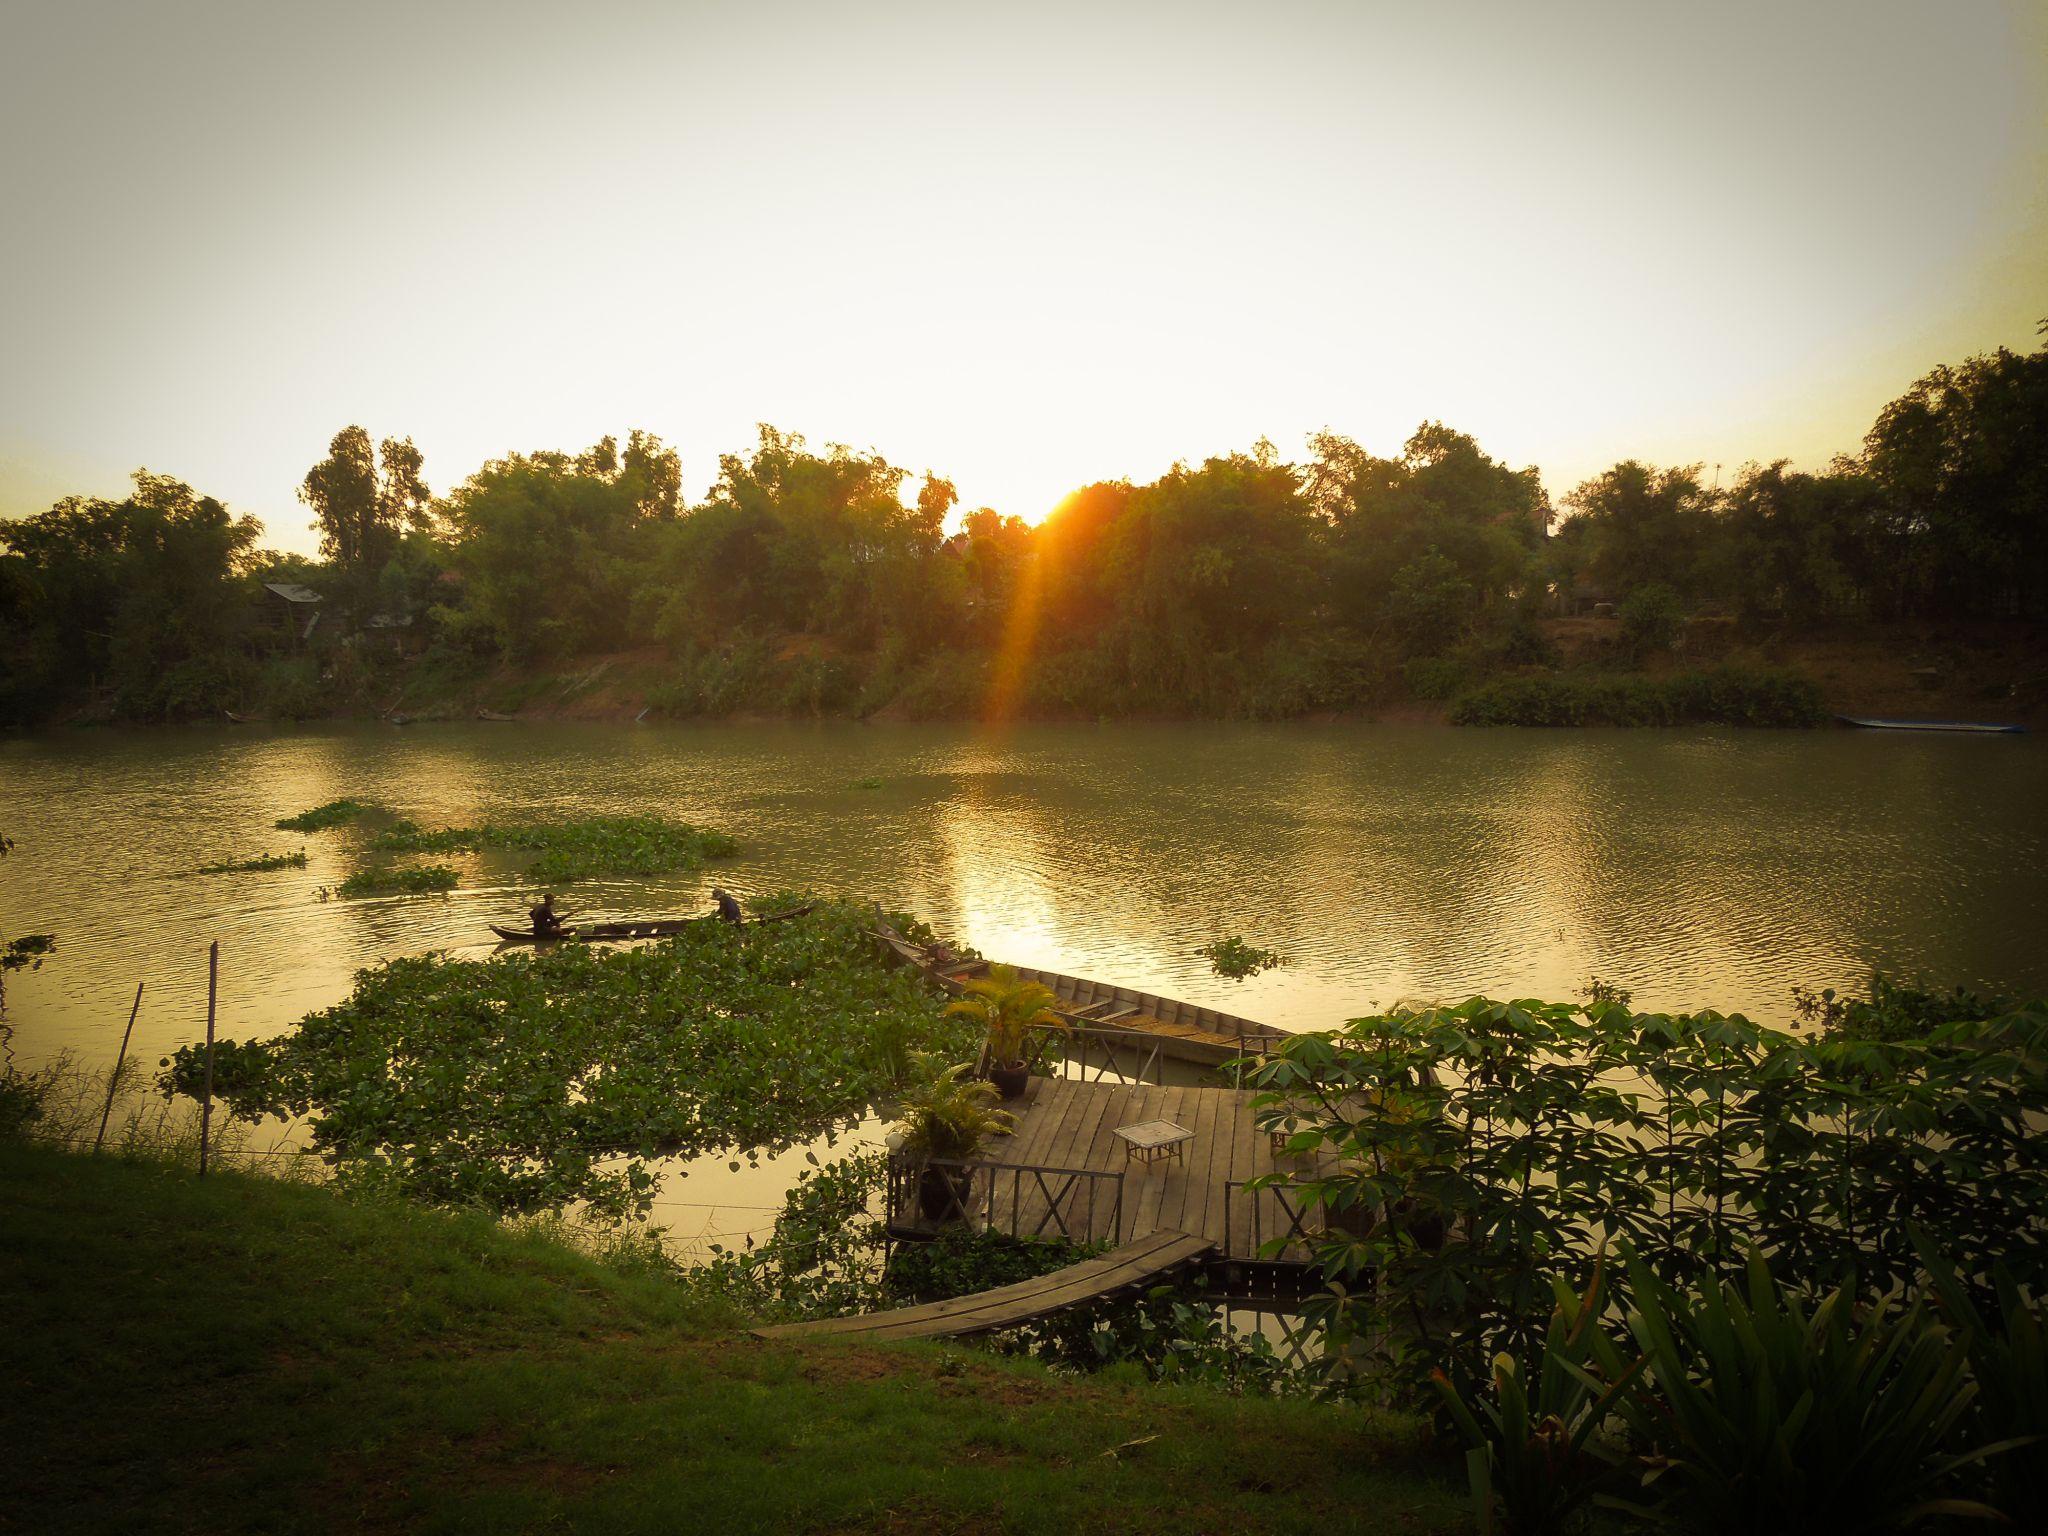 Sunrise over Mekong branch, Cambodia